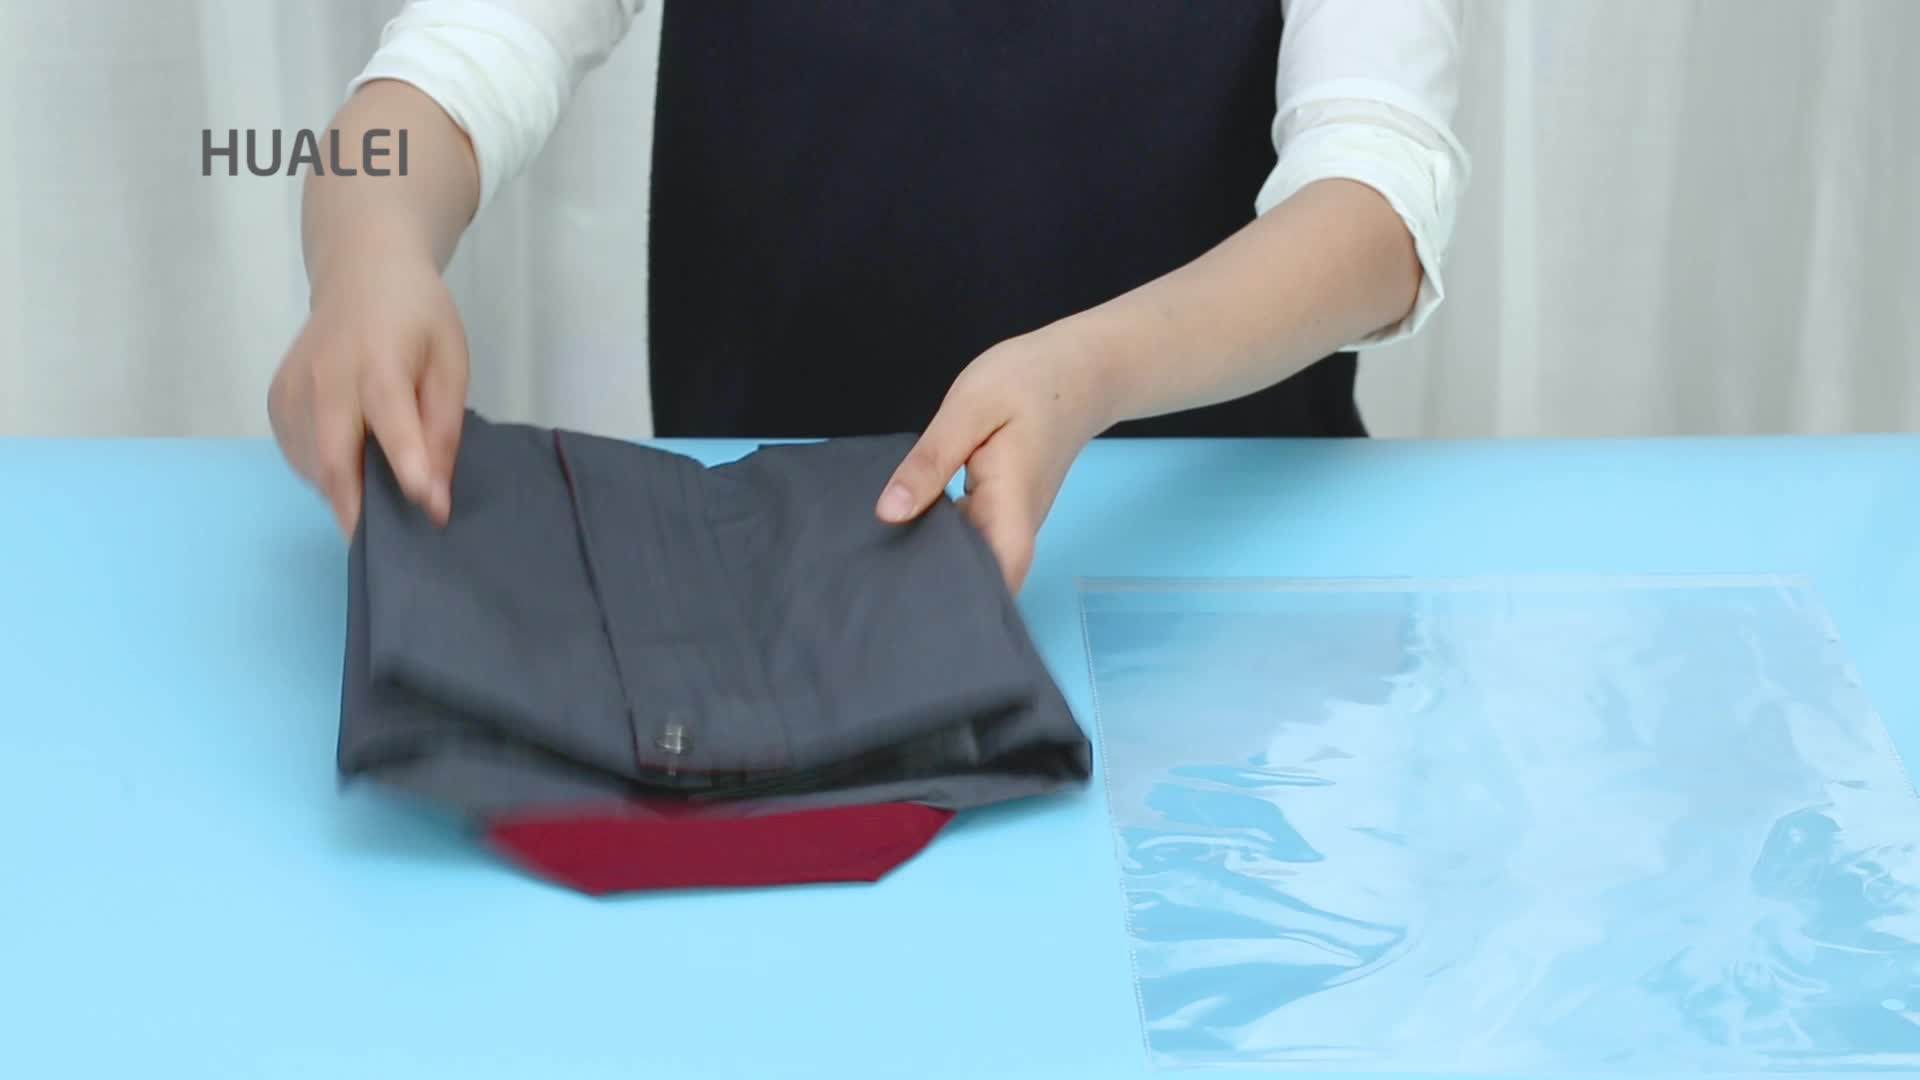 सस्ते थोक पारदर्शी स्वयं चिपकने वाला गर्मी सील OPP प्लास्टिक पाली BOPP पैकेजिंग सिलोफ़न बैग थोक